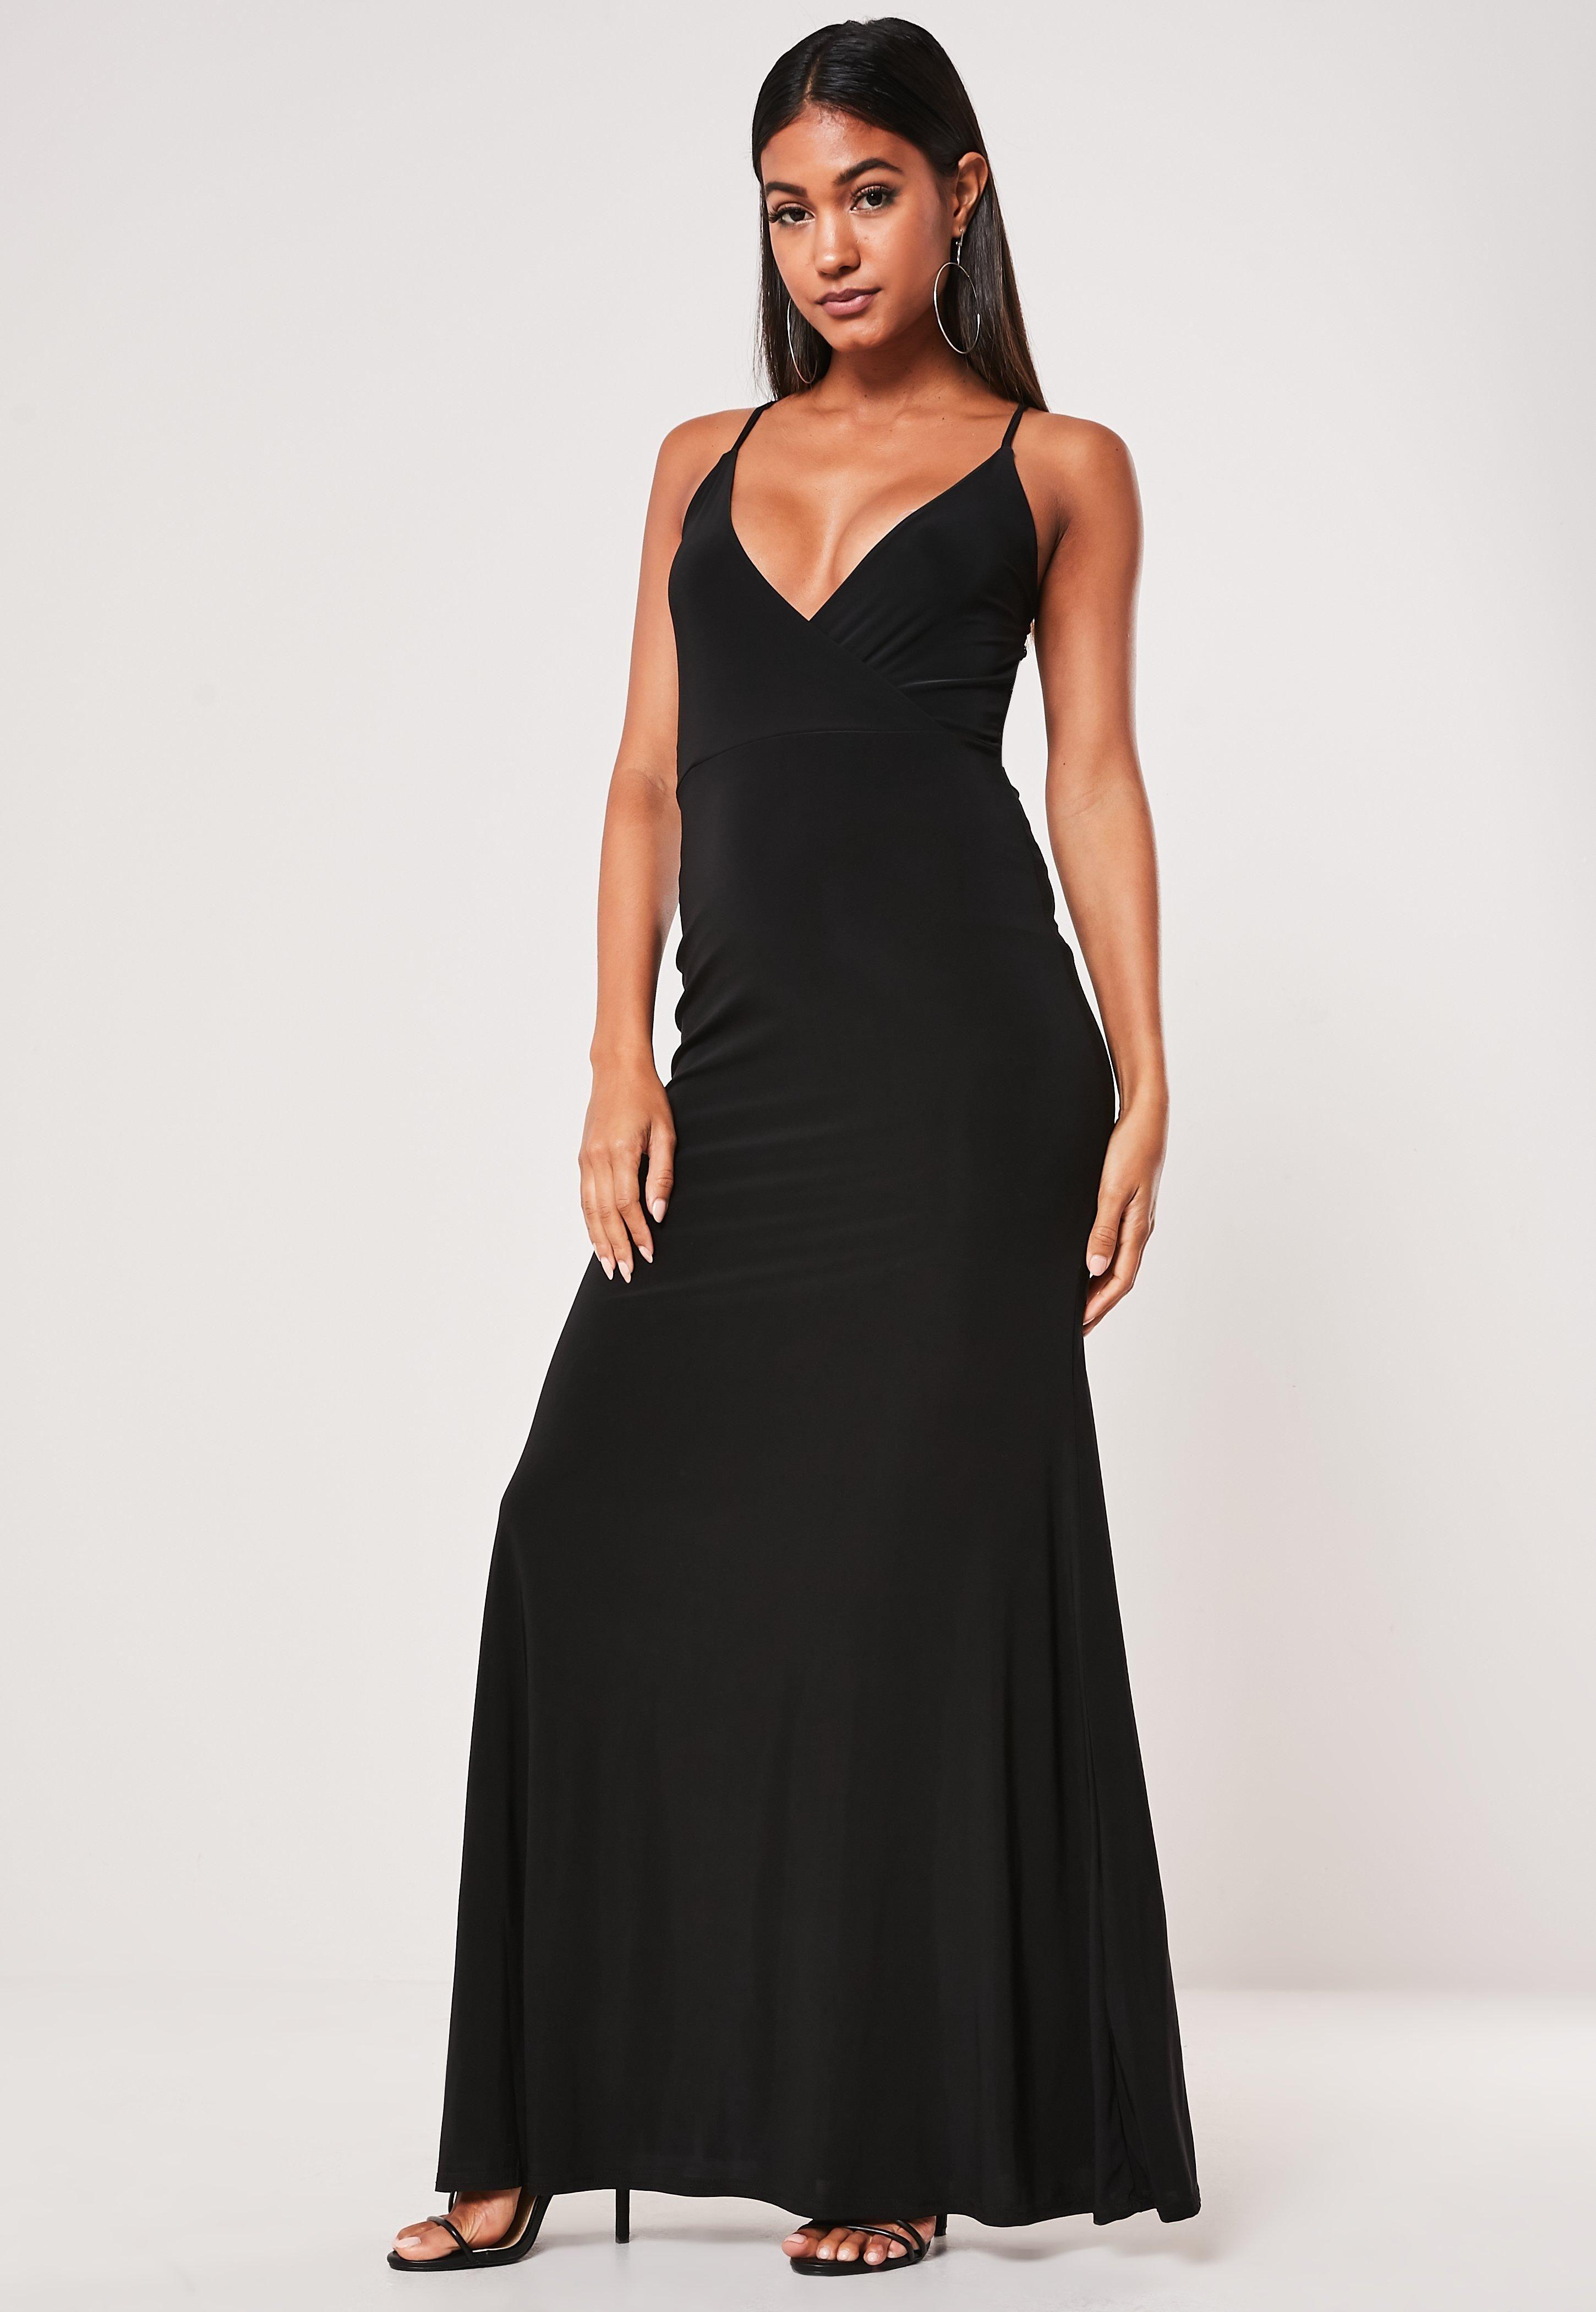 Black Slinky Lace Back Strappy Maxi Dress Sponsored Lace Affiliate Slinky Black Women Dress Online Dresses Trending Dresses [ 4200 x 2900 Pixel ]